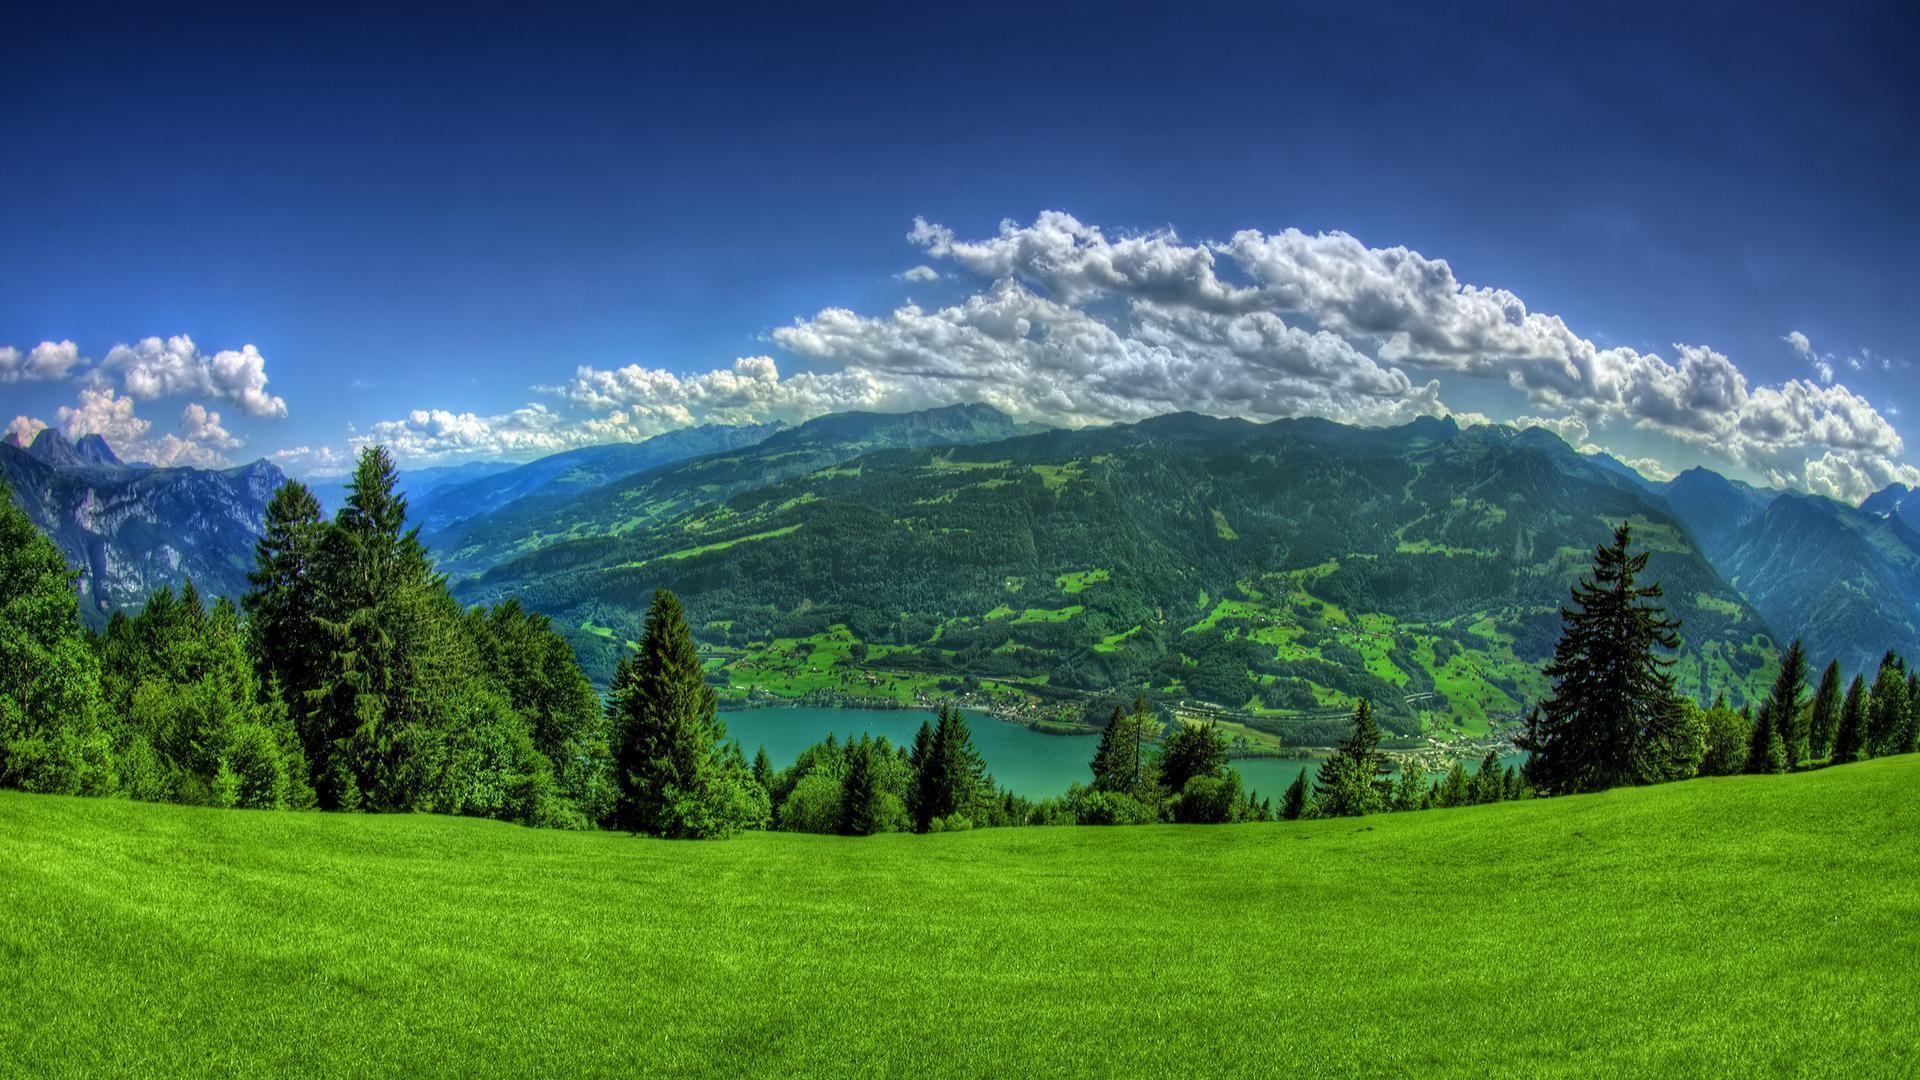 Free Download 1080p Nature Wallpapers Hd Desktop Wallpapers